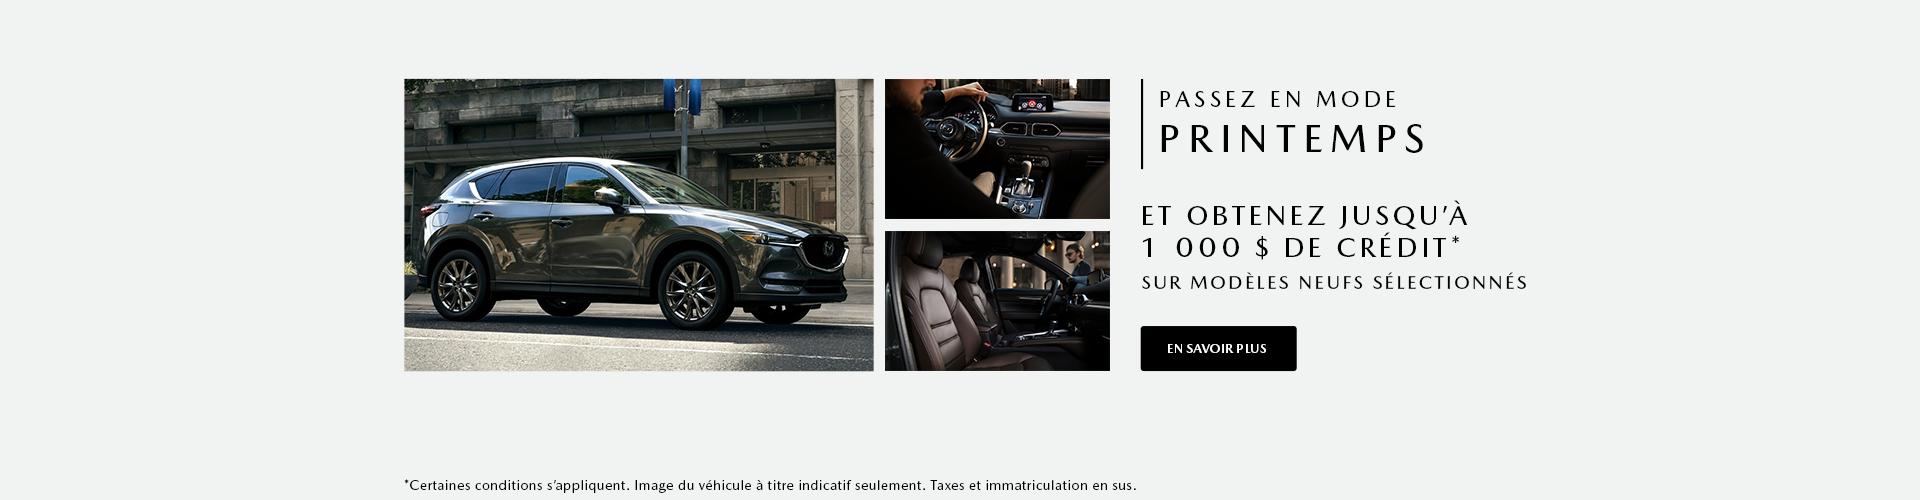 Passez en mode printemps - Mazda headers